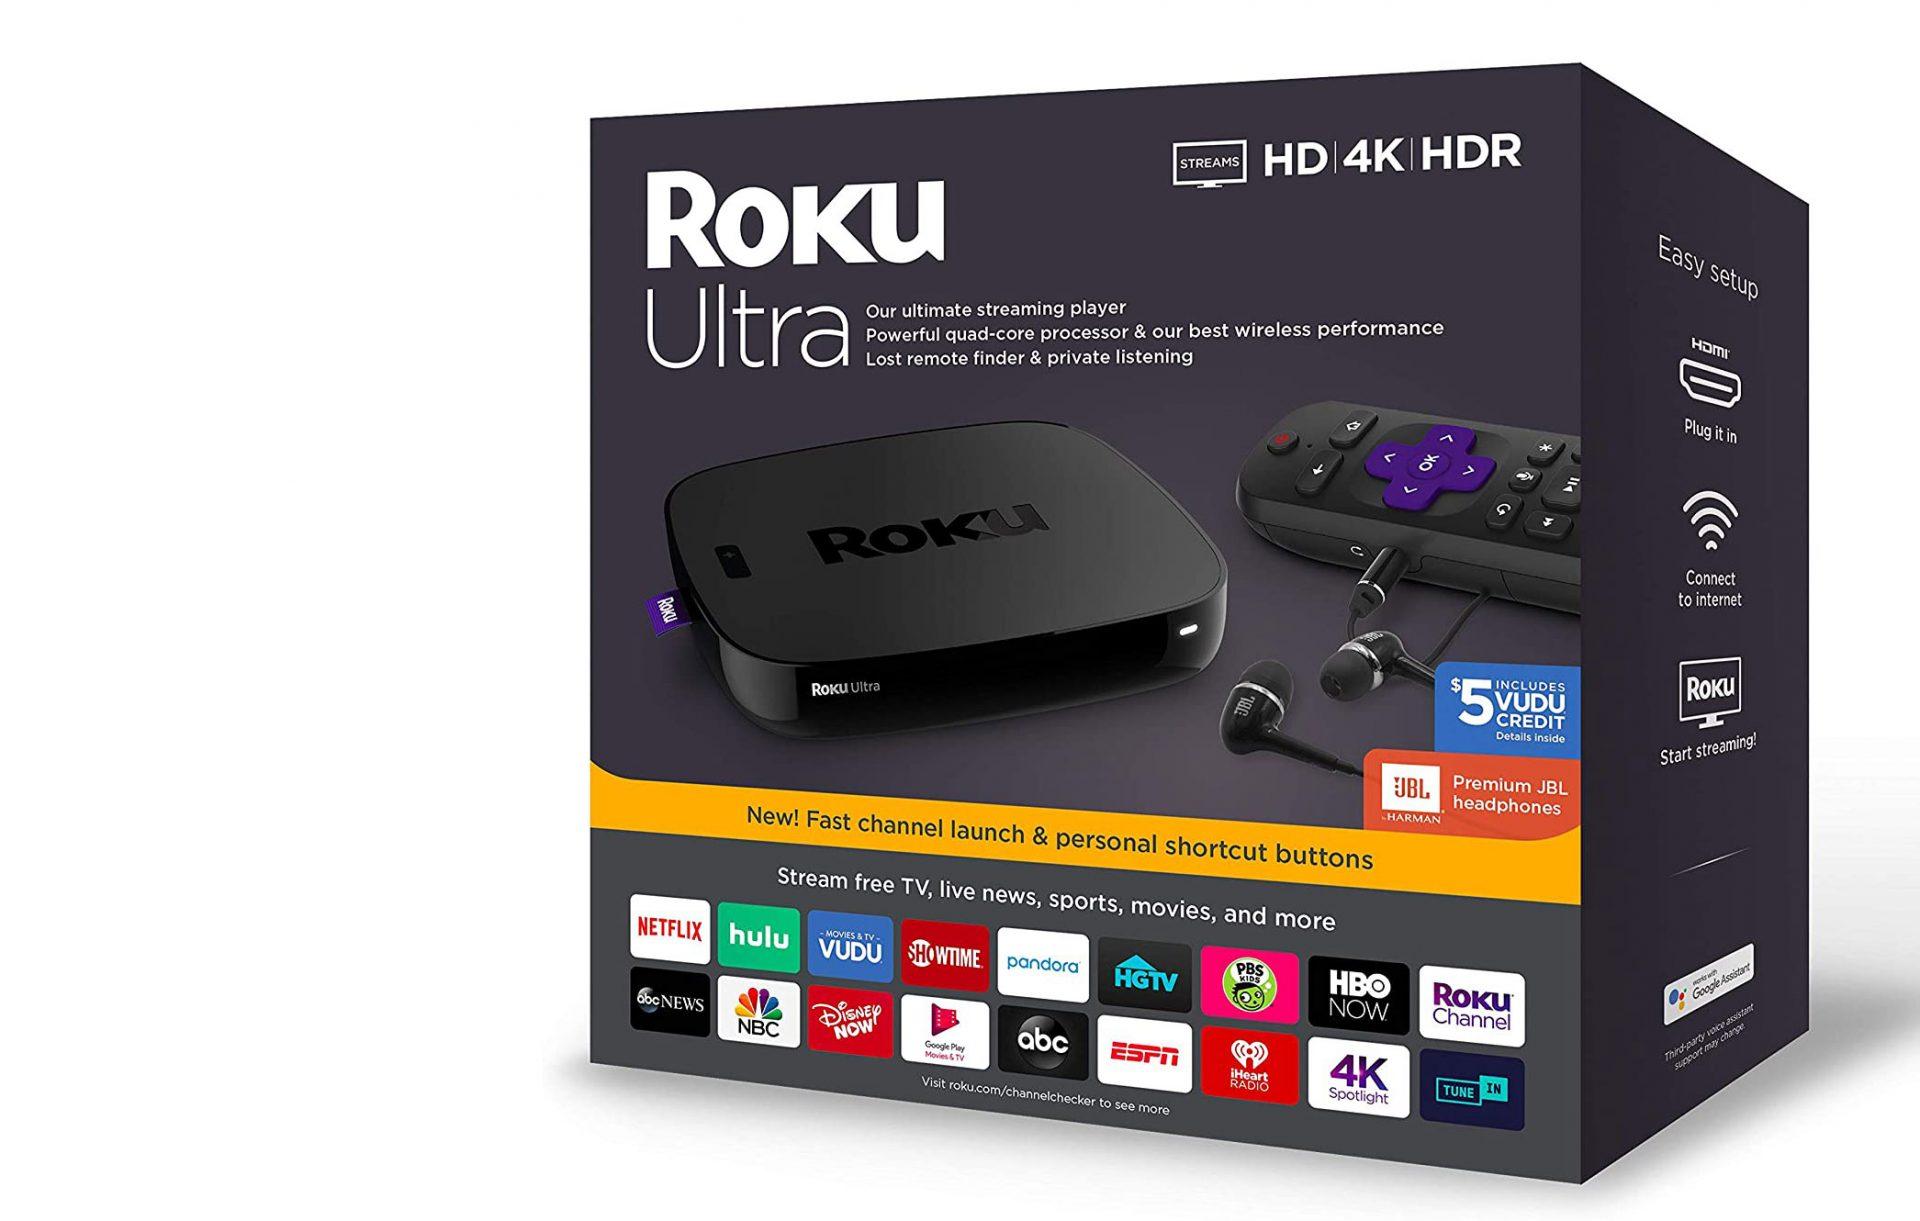 Roku Ultra | #1 Streaming Media Player